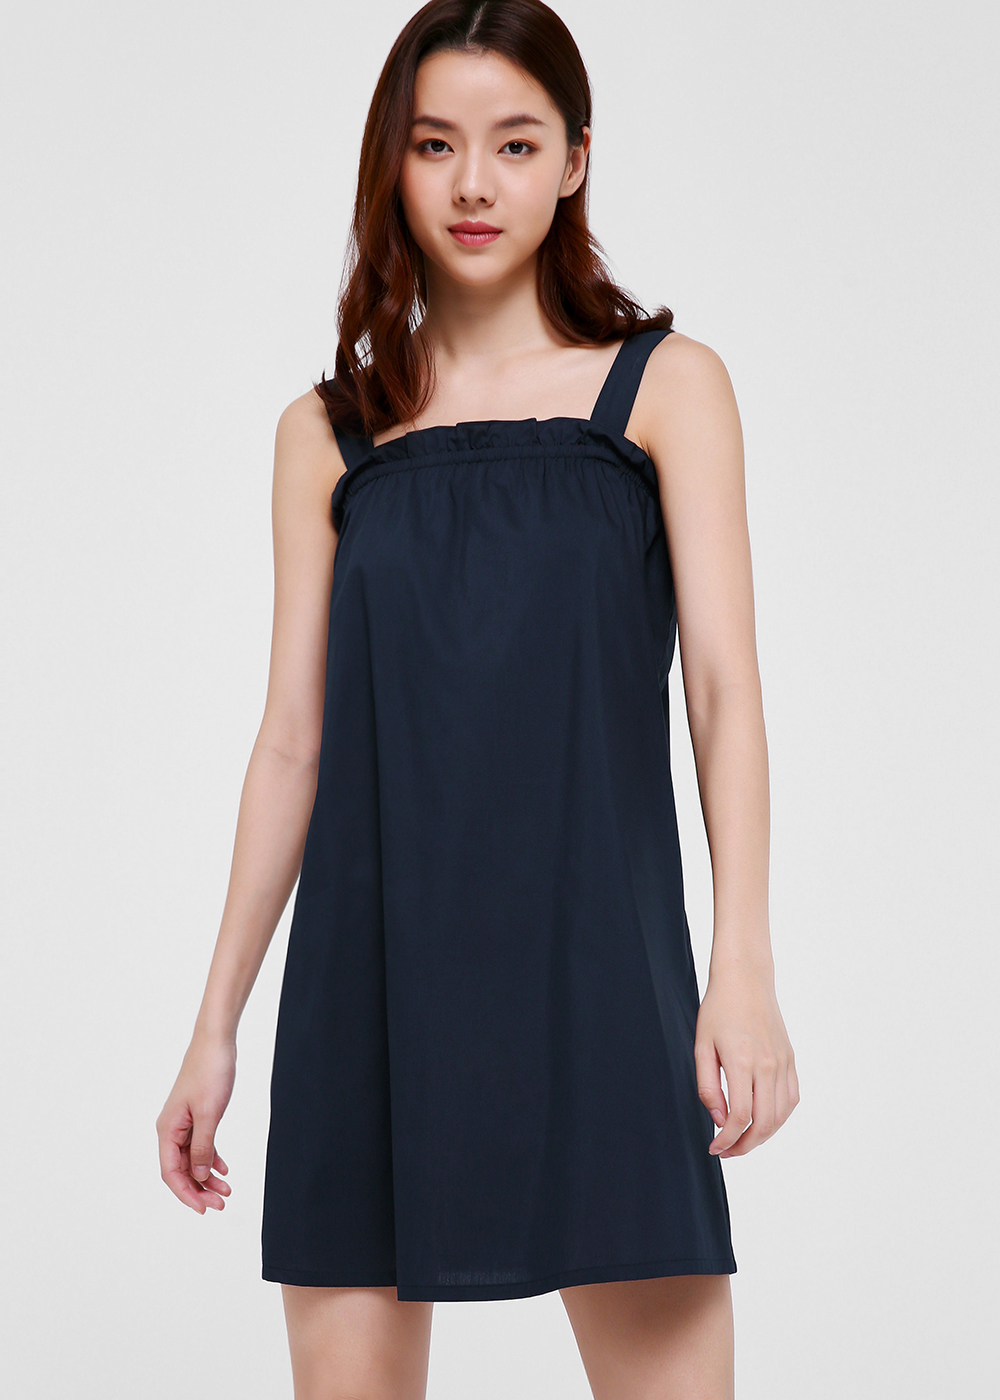 Emiline Smocked Dress